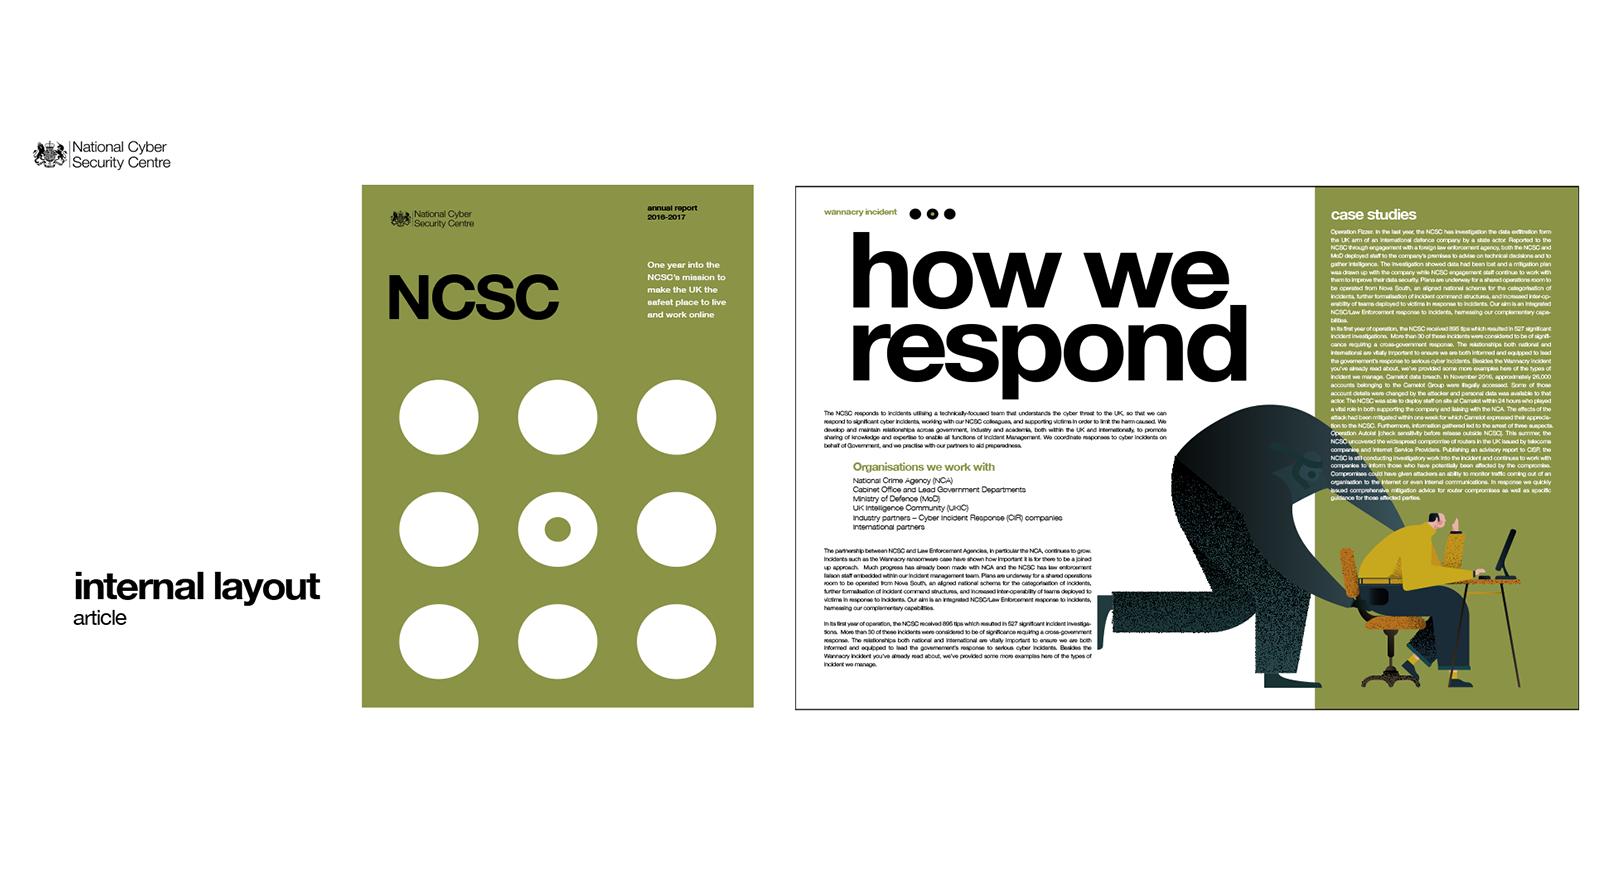 NCSC_AnnualReview_5